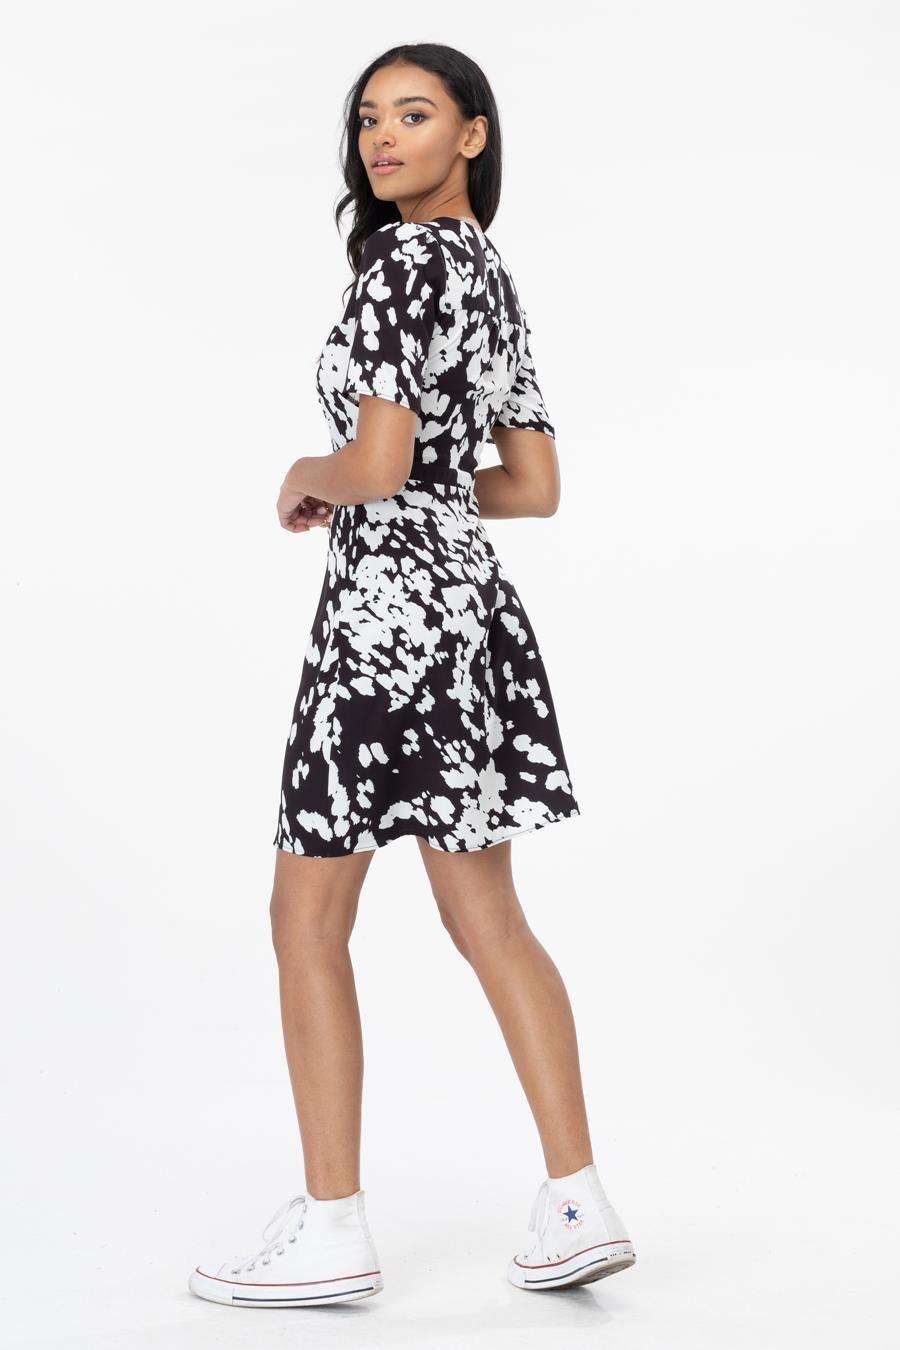 Hype Abstract Cow Print Womens Tea Dress